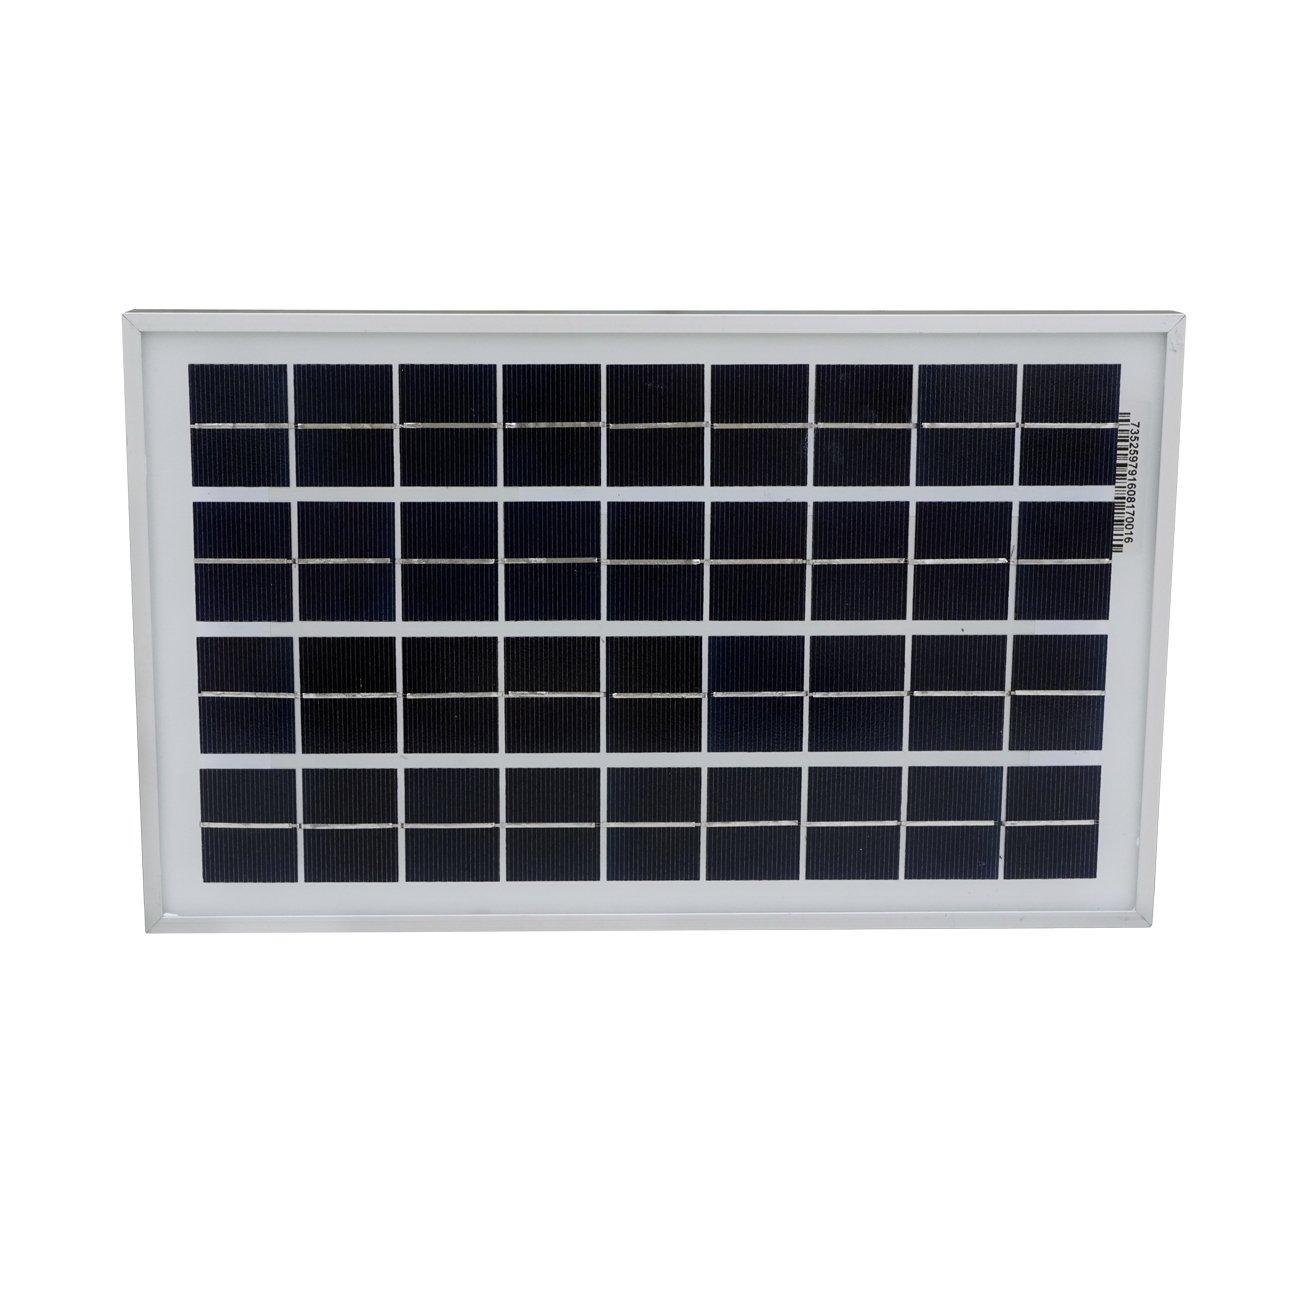 Amazon.com : ECO-WORTHY 10W Solar Panel 10 Watt 12 Volt Pv Solar Module, Solar  Cell Panel : Garden & Outdoor